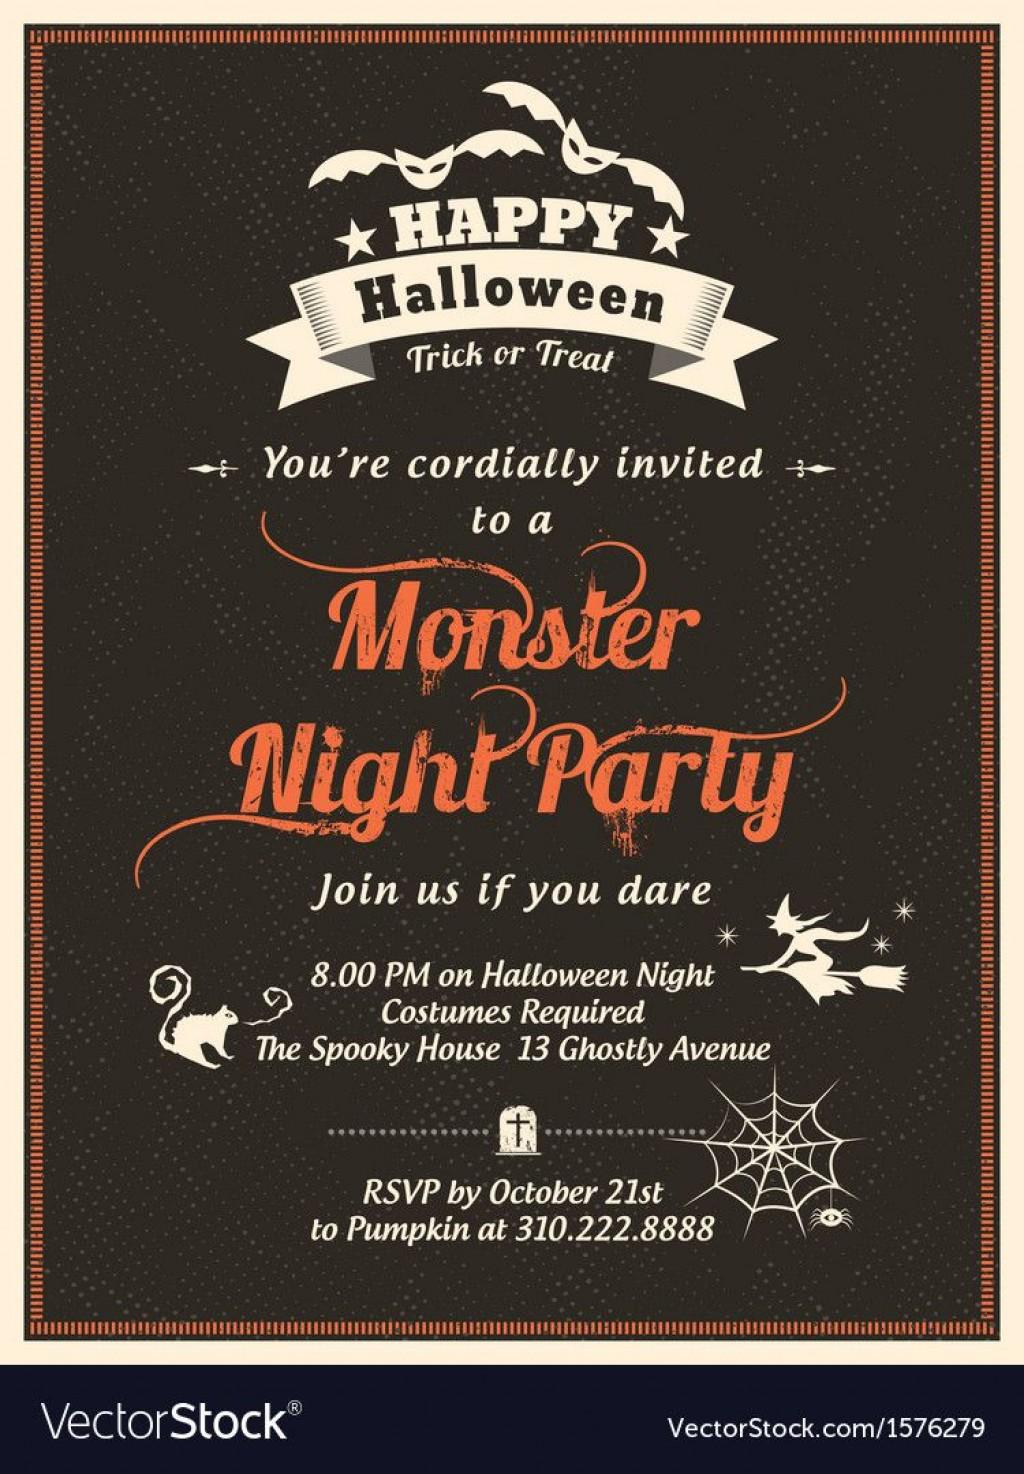 010 Staggering Halloween Party Invitation Template Inspiration  Microsoft Block OctoberLarge